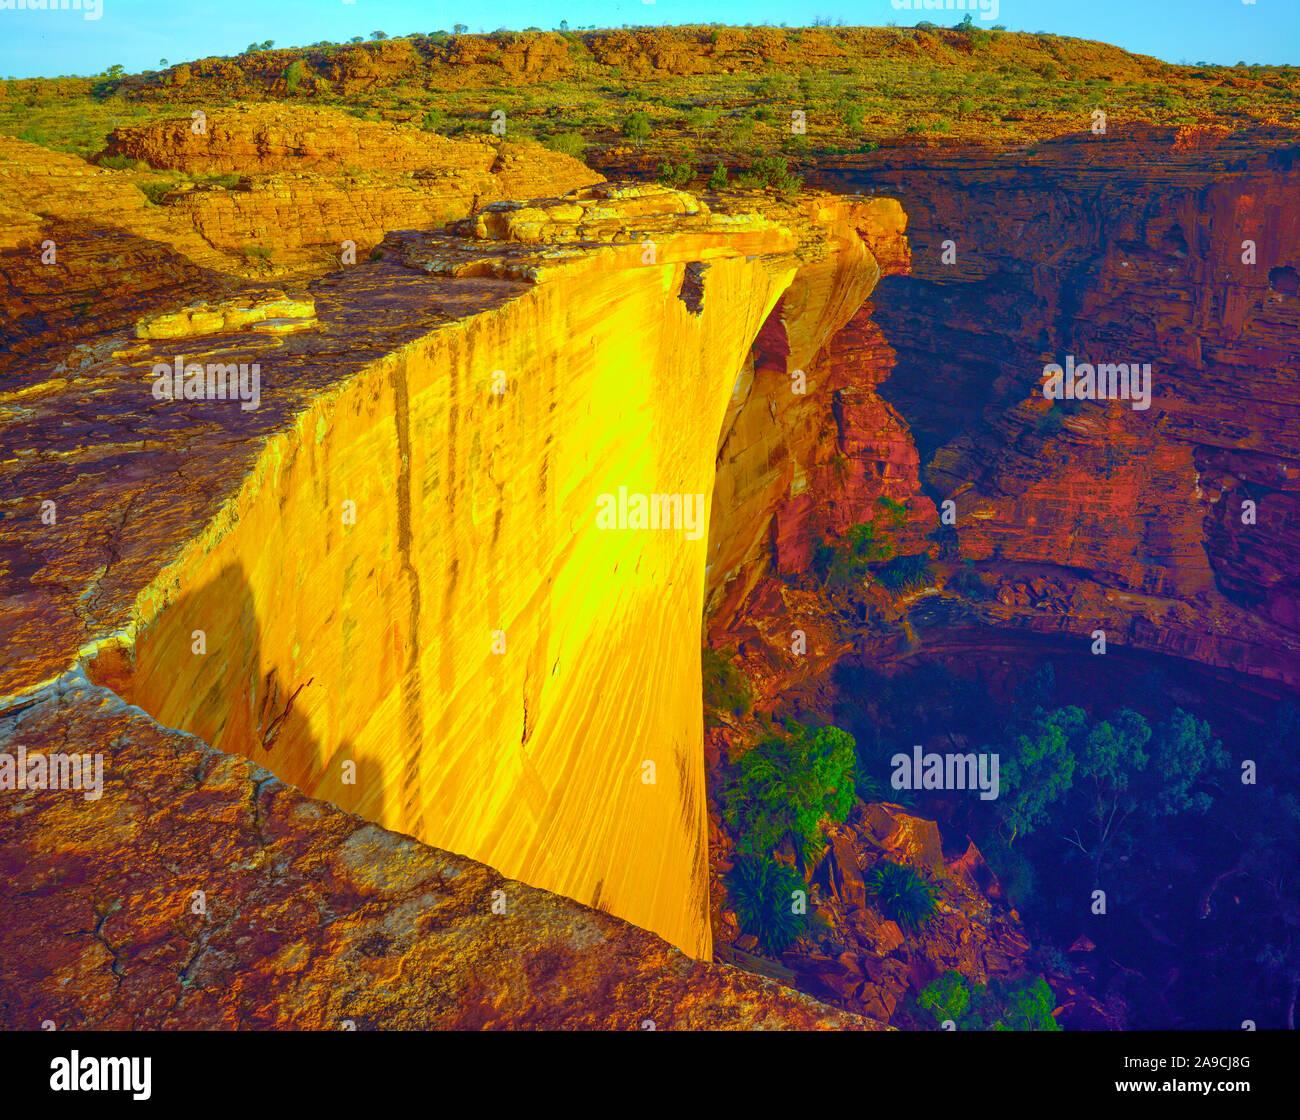 Rim of King Canyon, Watarrka National Park, Australia, Australian Red Centre Way Stock Photo